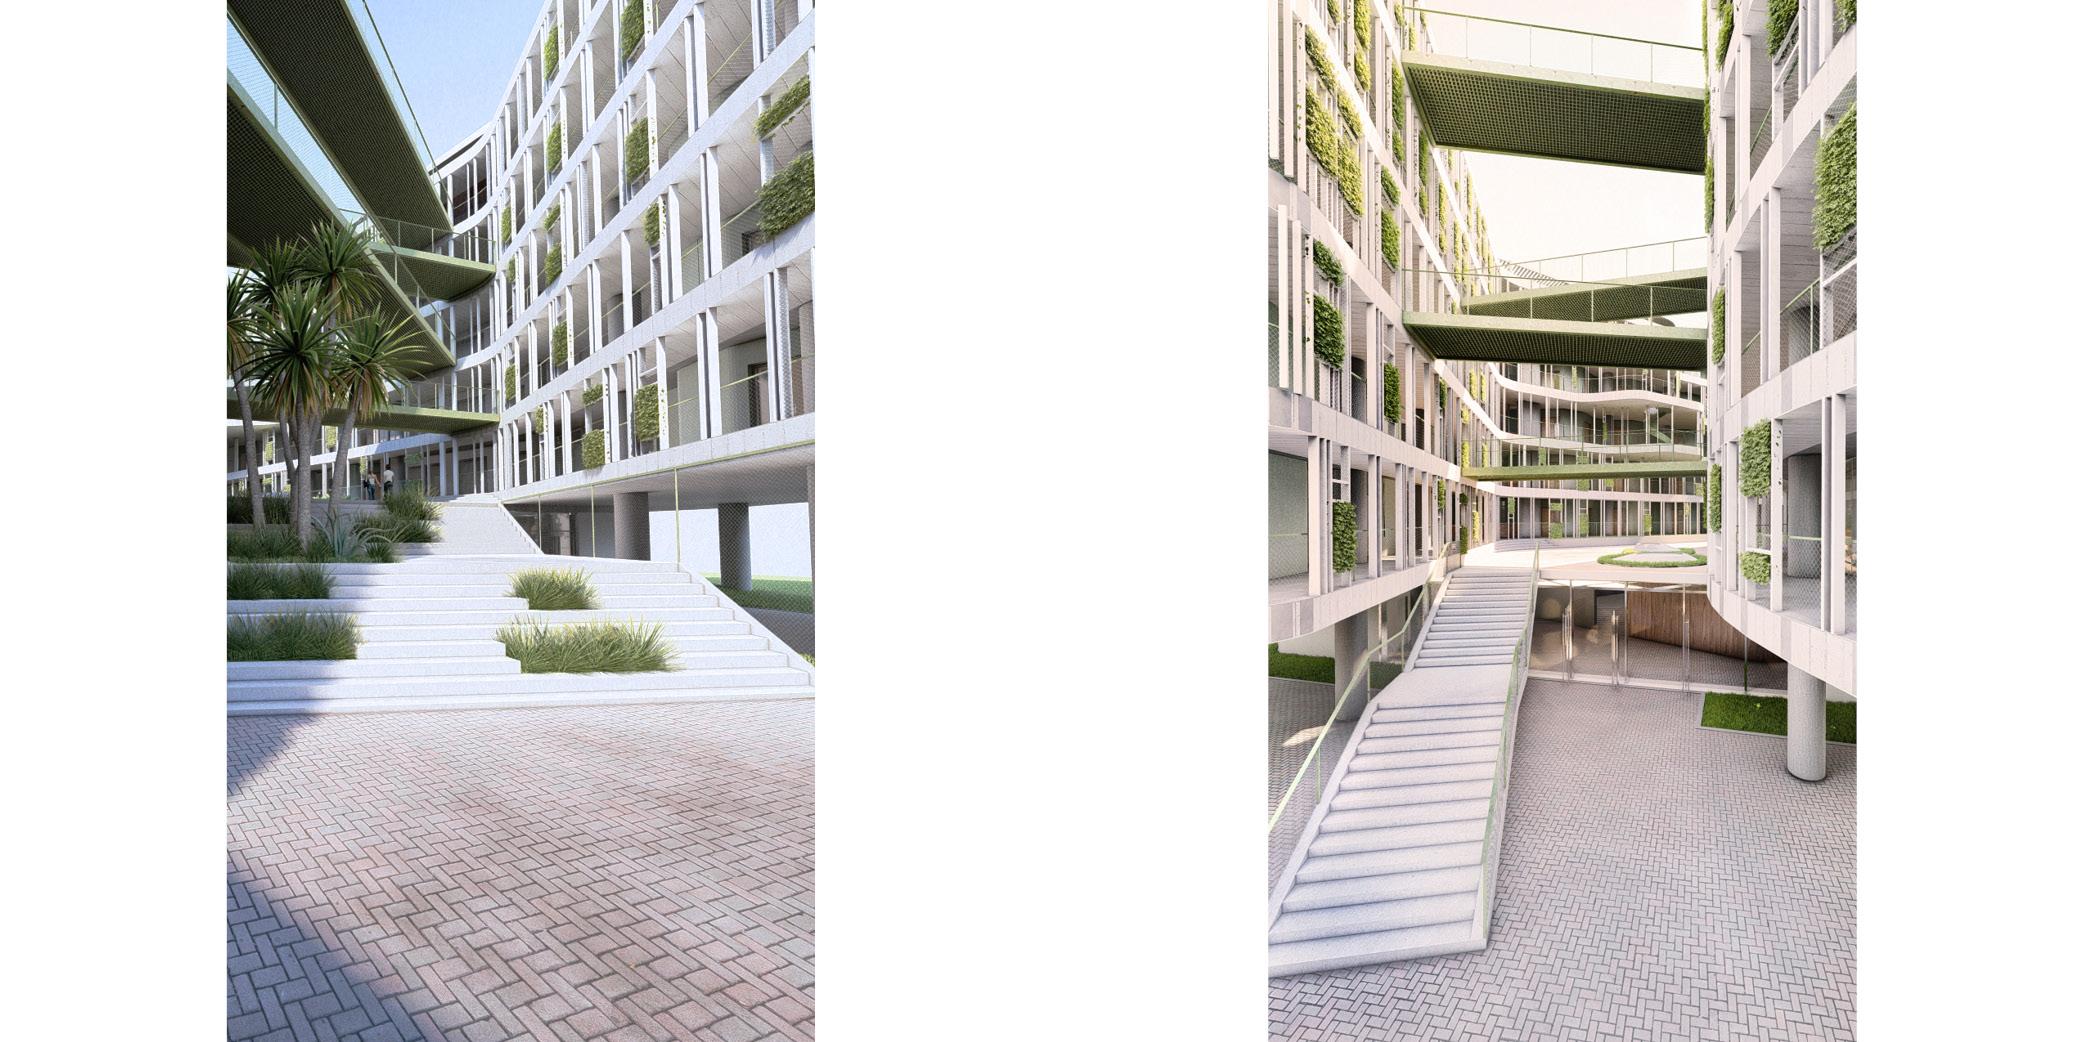 OCA architects Dormitories of the Cyprus University of Technology in Limassol - Κοιτώνες Κύπρος Λεμεσός Hernan Lleida Ruiz Bernardo Garcia Morales5